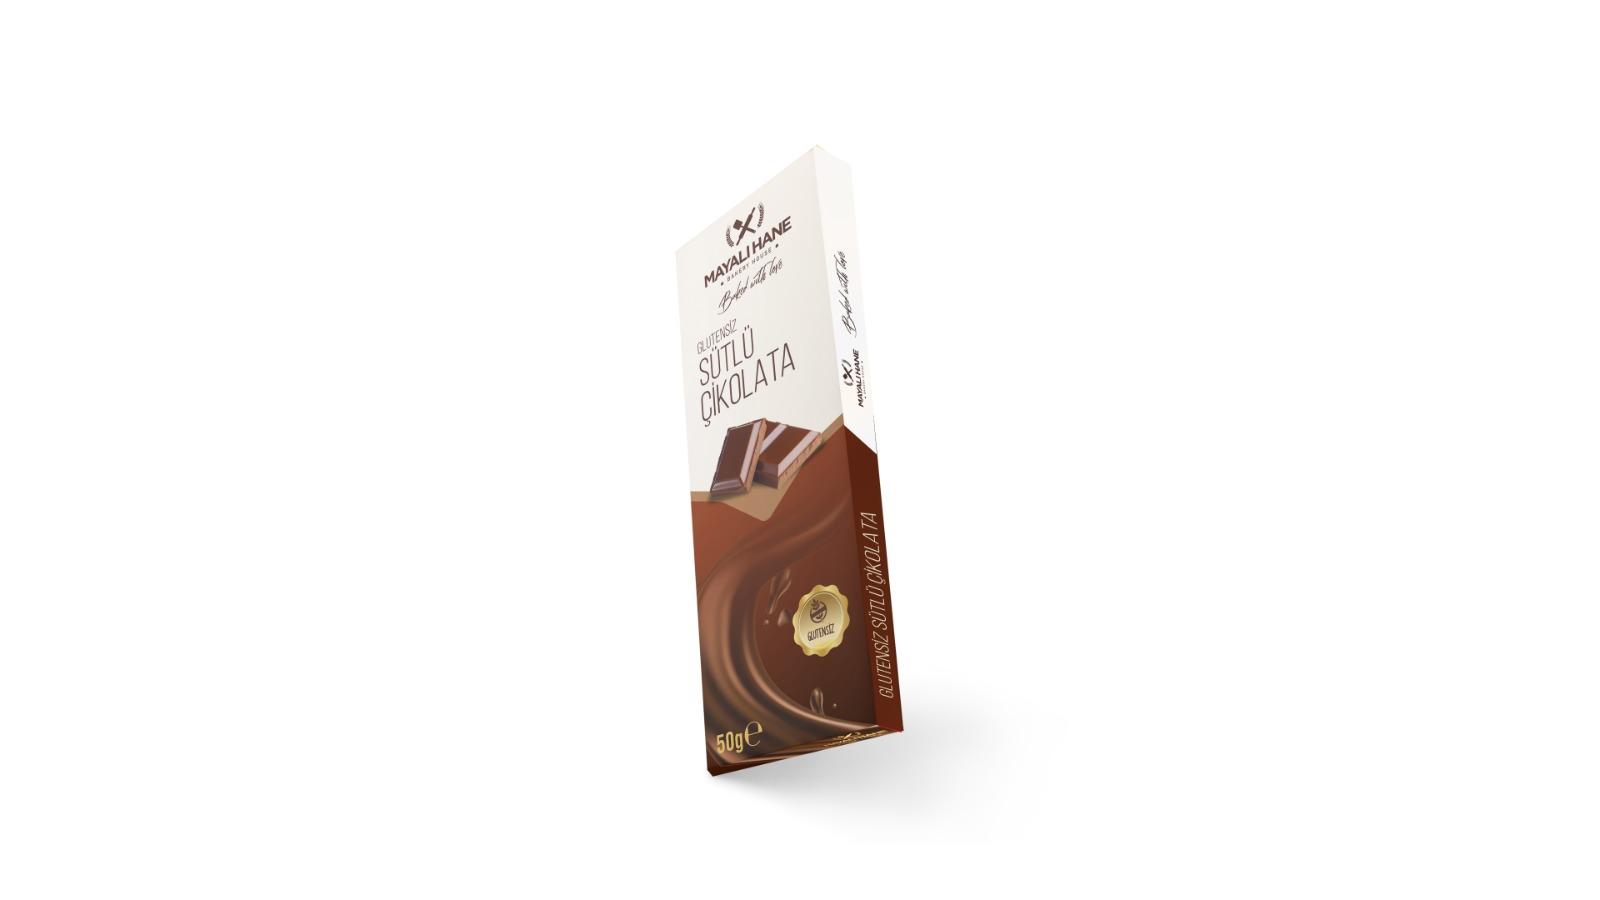 Mayalı Hane Glutensiz Tablet Çikolata 50 gr